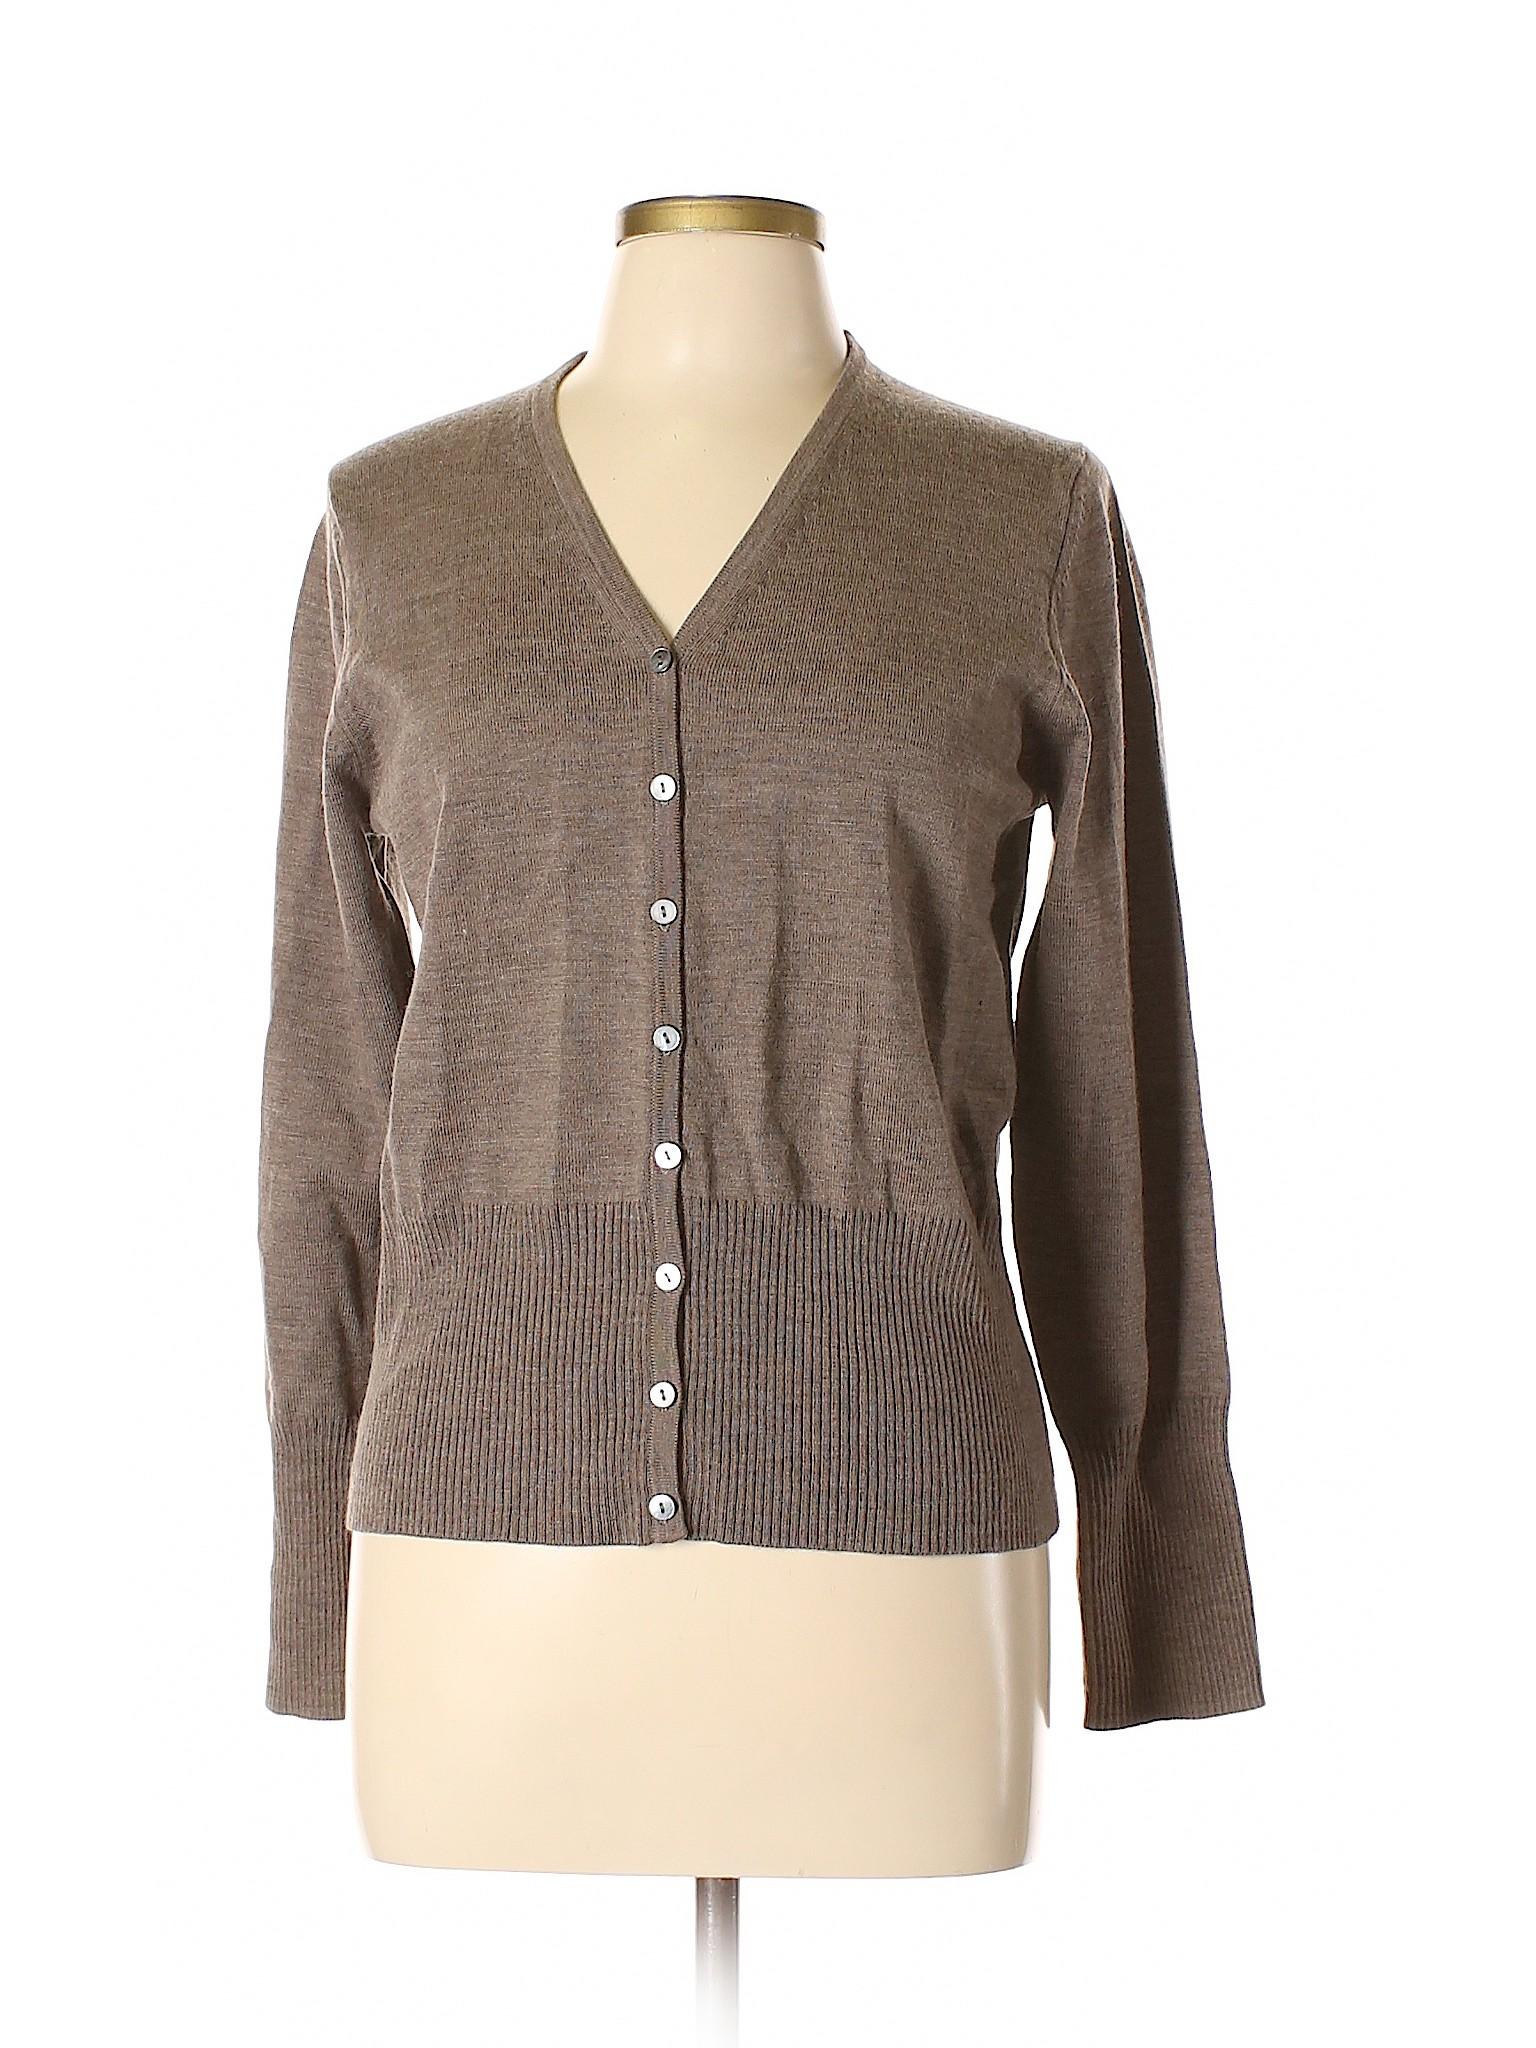 Charter Club Cardigan Boutique Boutique Charter Wool 1xz76z